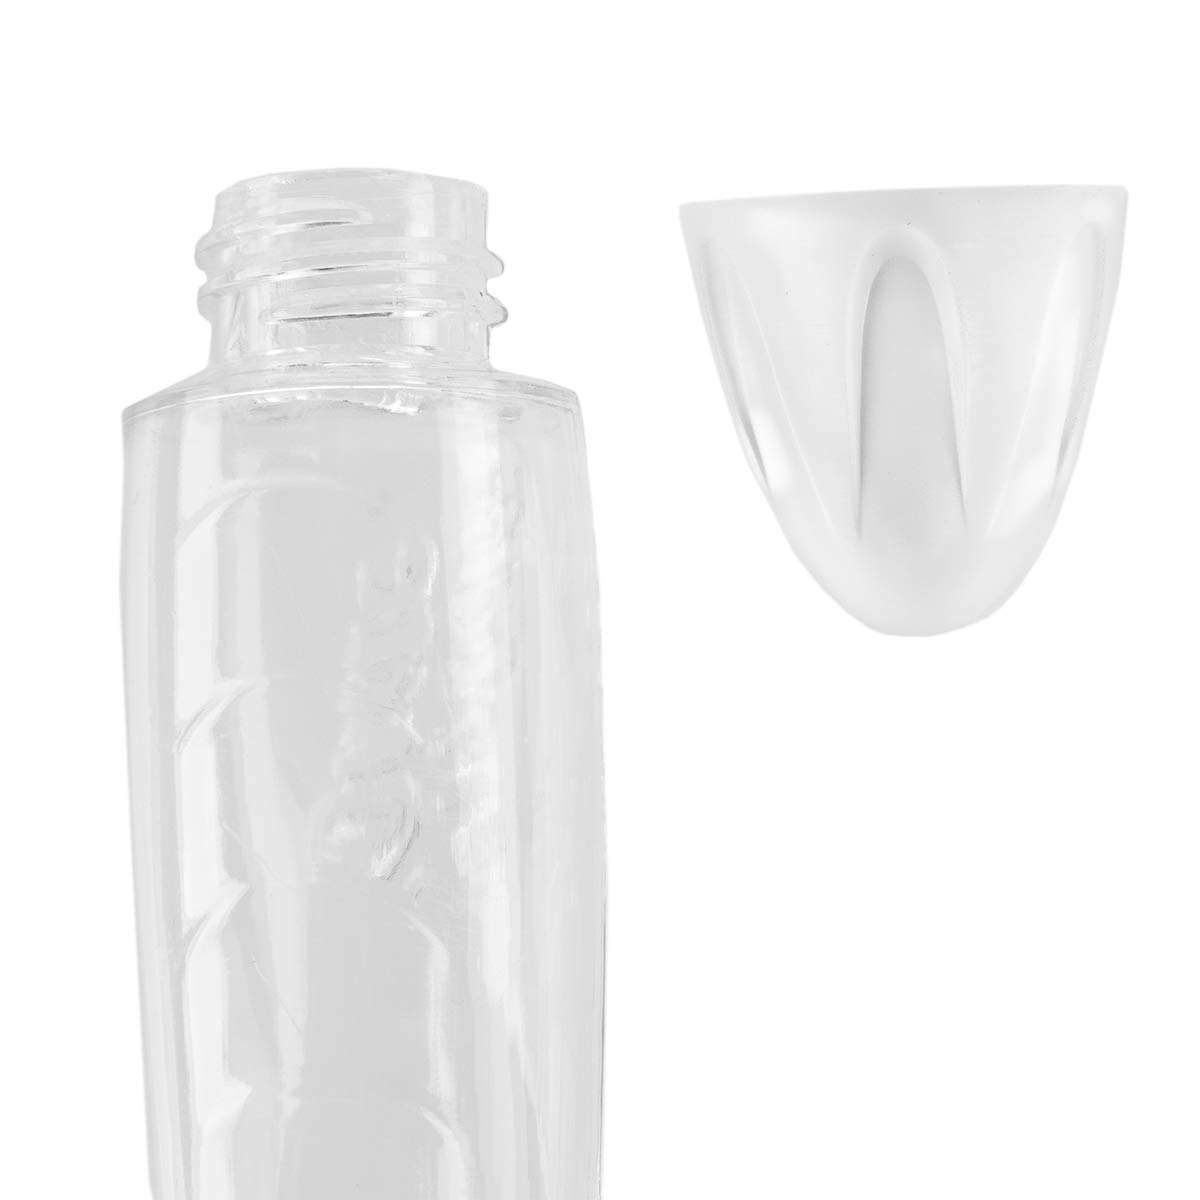 Scotch-Brite Dishwand and Sponge Refills (2 Dishwands & 6 Refill Heads) by Scotch-Brite (Image #6)